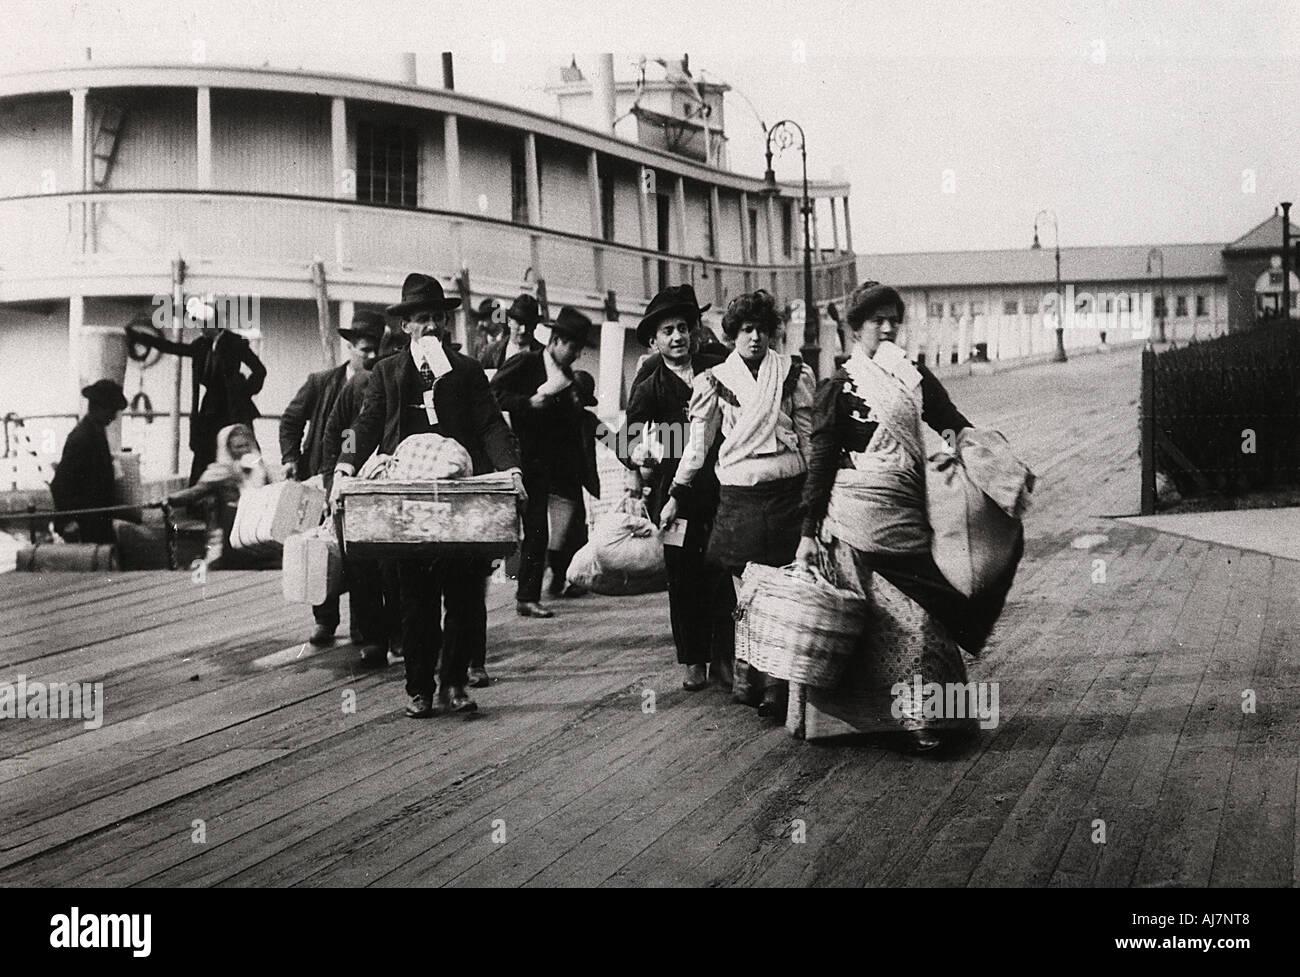 Os imigrantes para os EUA desembarque na Ilha Ellis Nova Iorque c1900 Foto de Stock